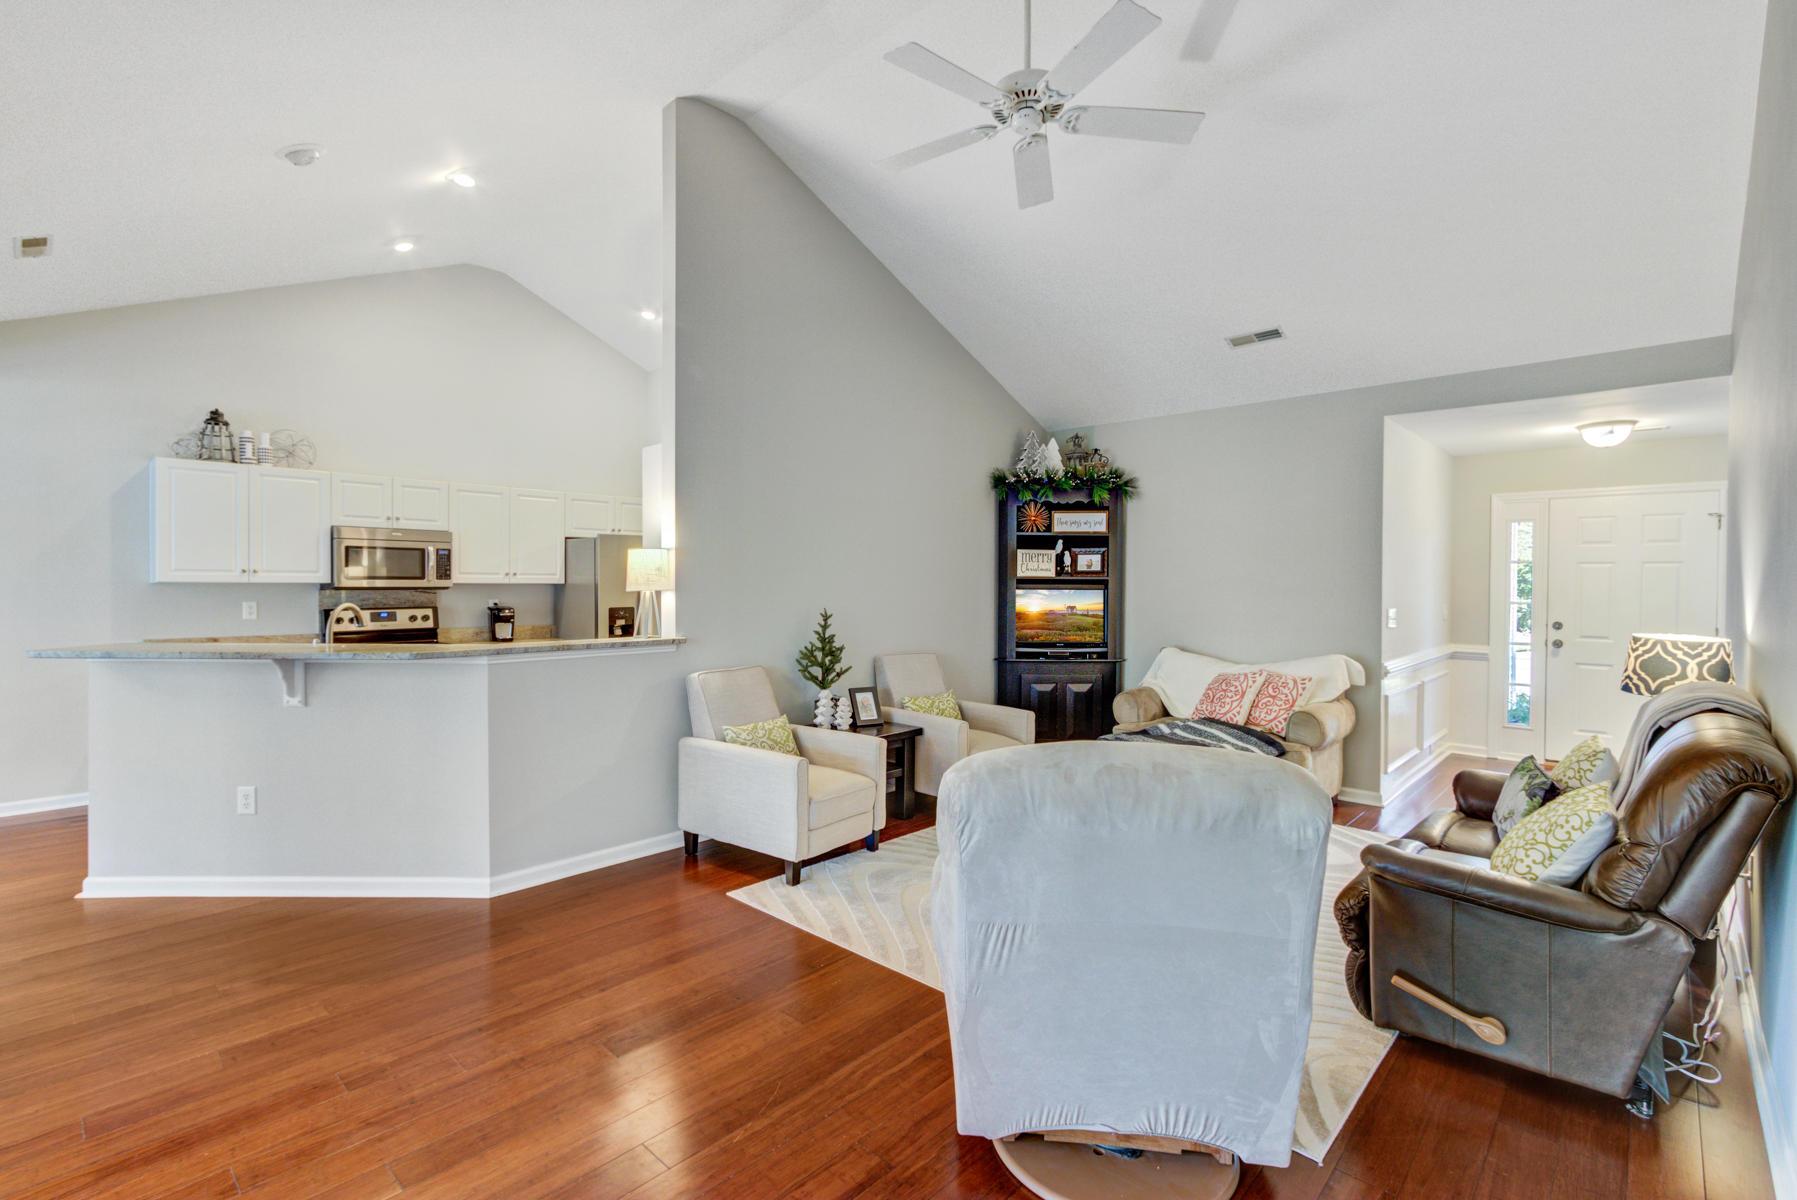 Park West Homes For Sale - 3444 Wellesley, Mount Pleasant, SC - 22